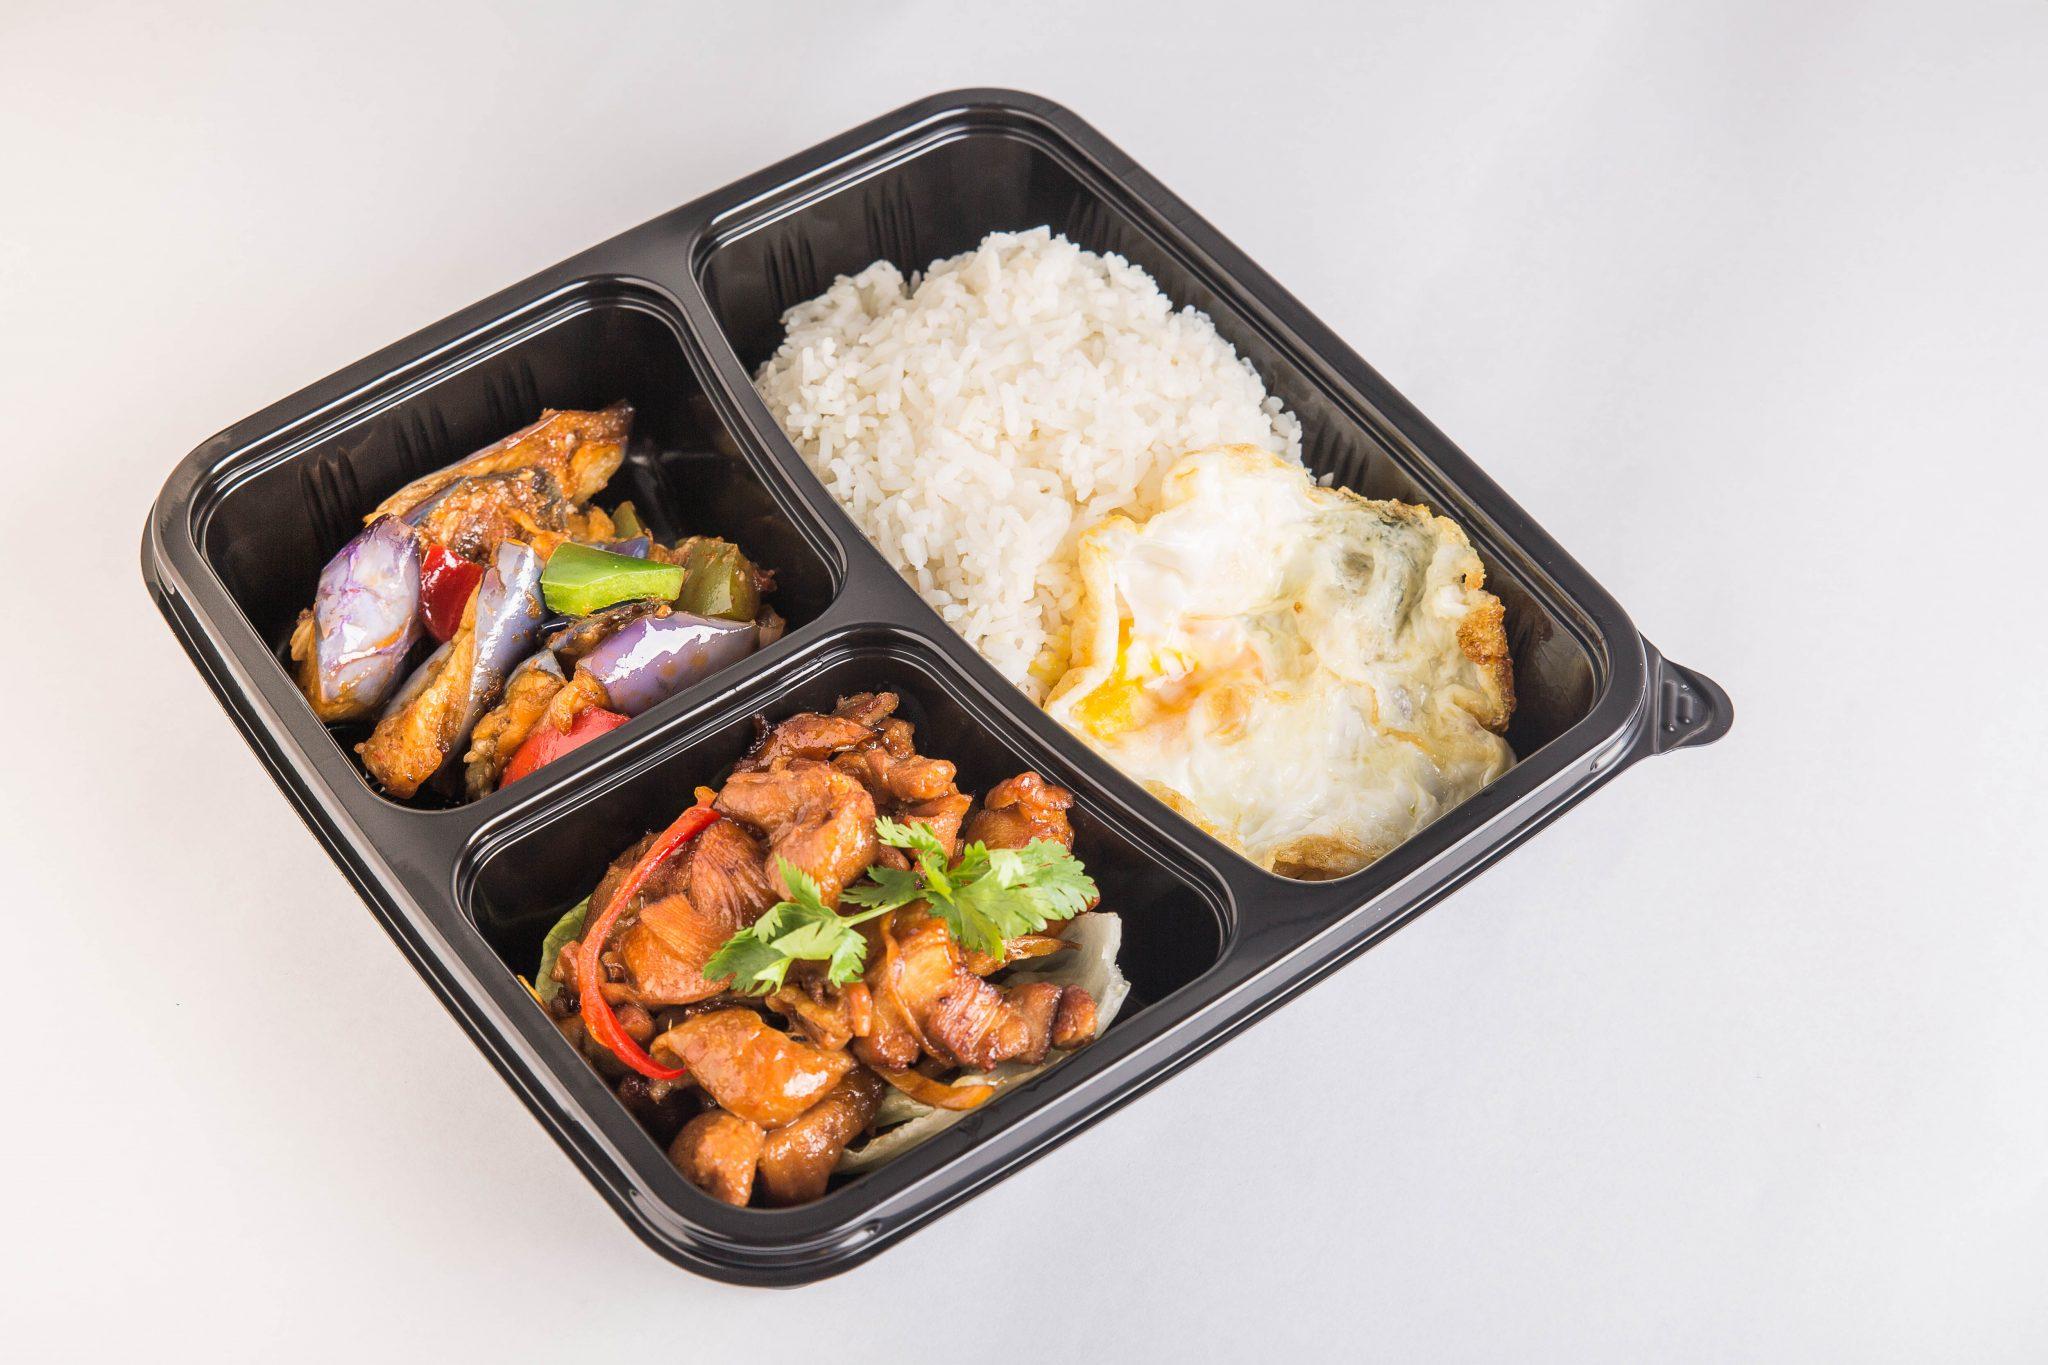 bento set, white rice, chicken, vegetable, egg